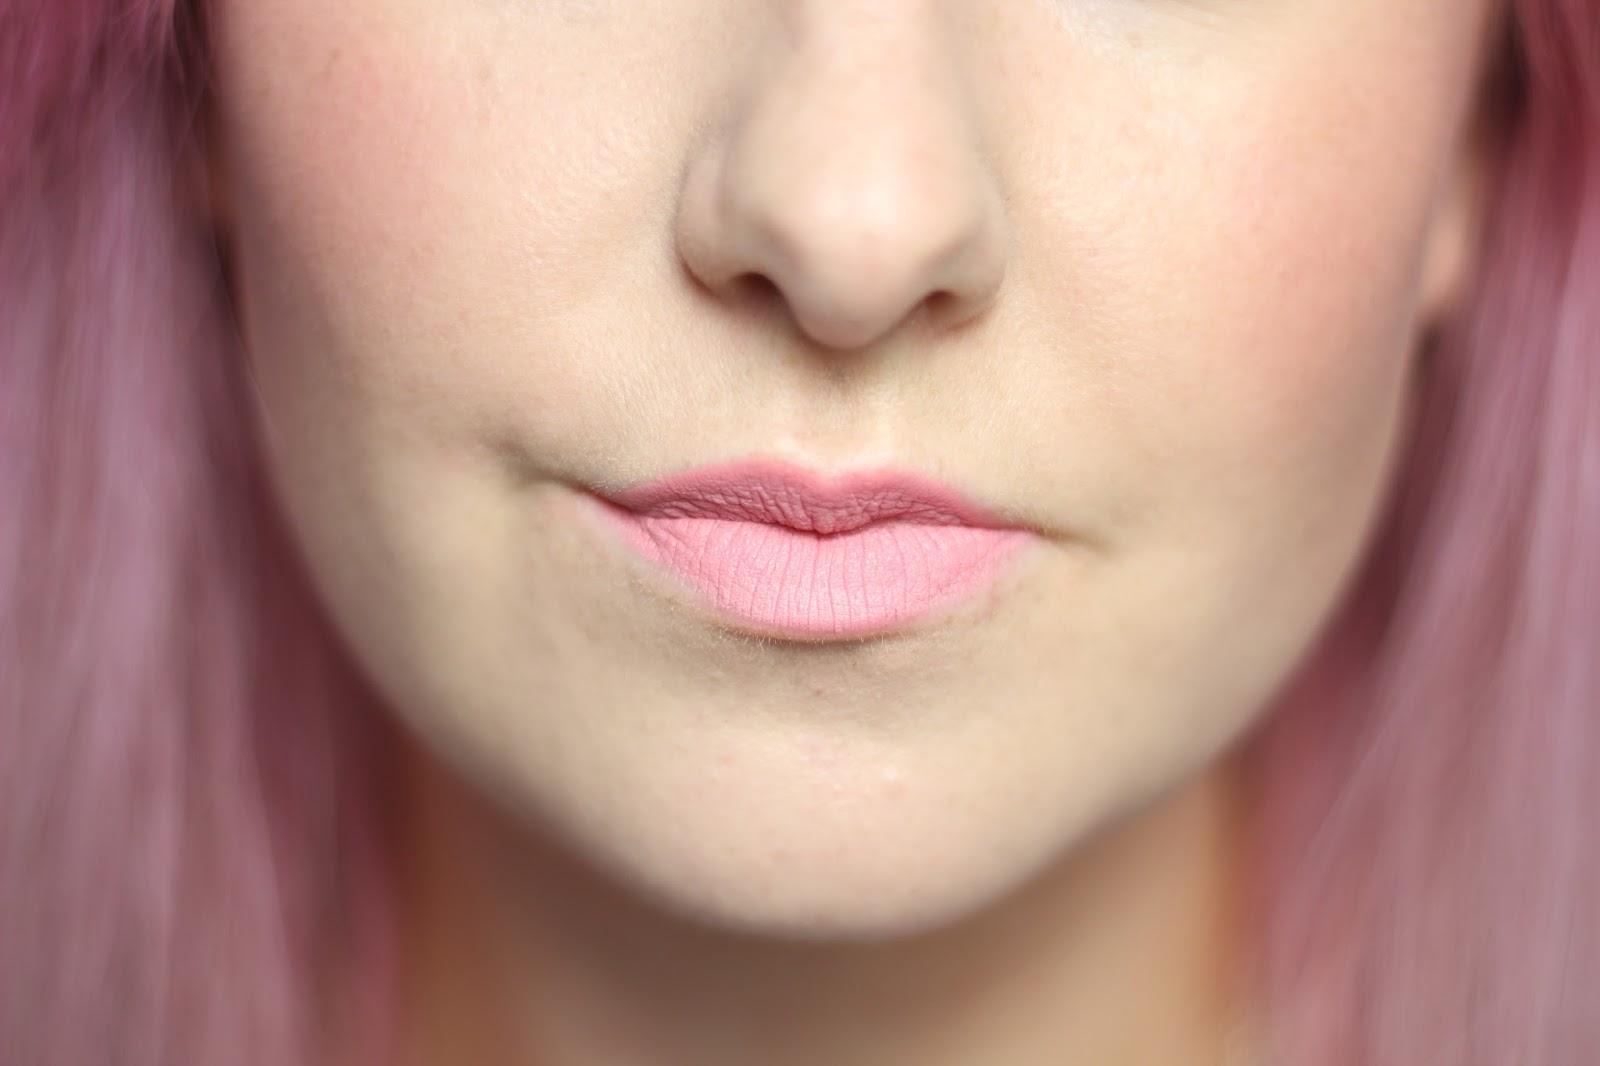 illamasqua-fable-lipstick, illamasqua-fable-lipstick-swatch